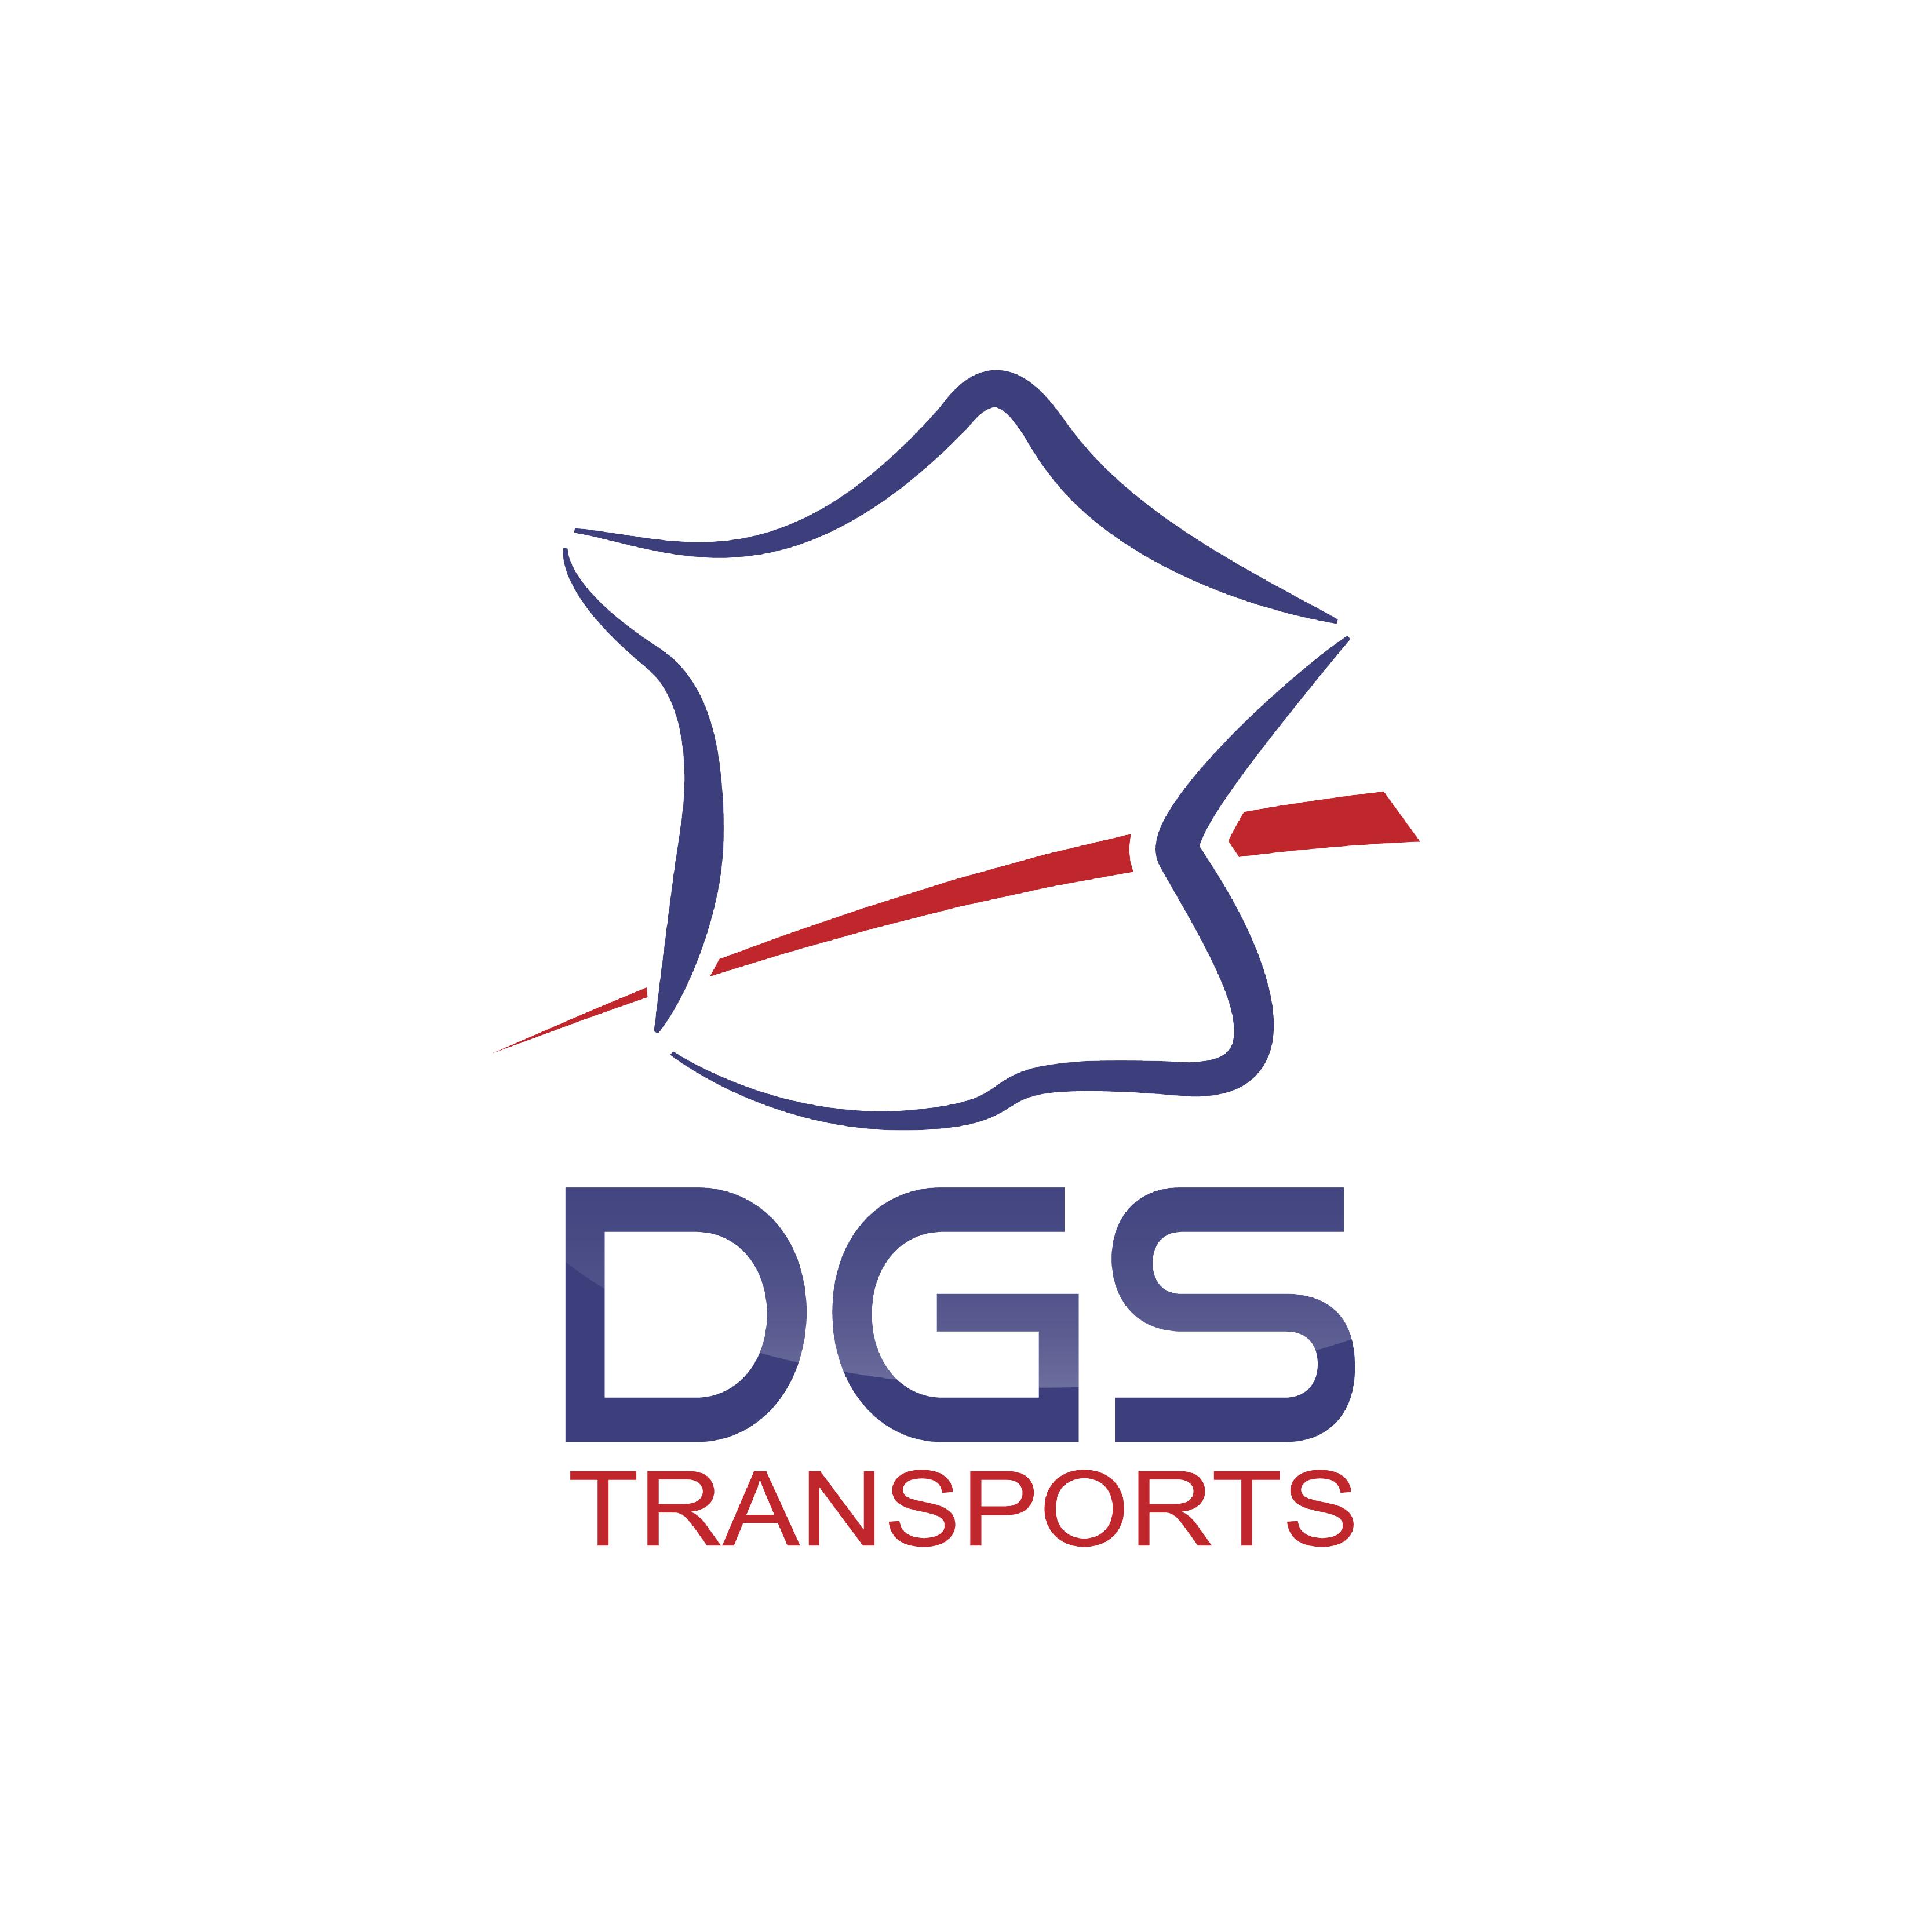 DGS Transports